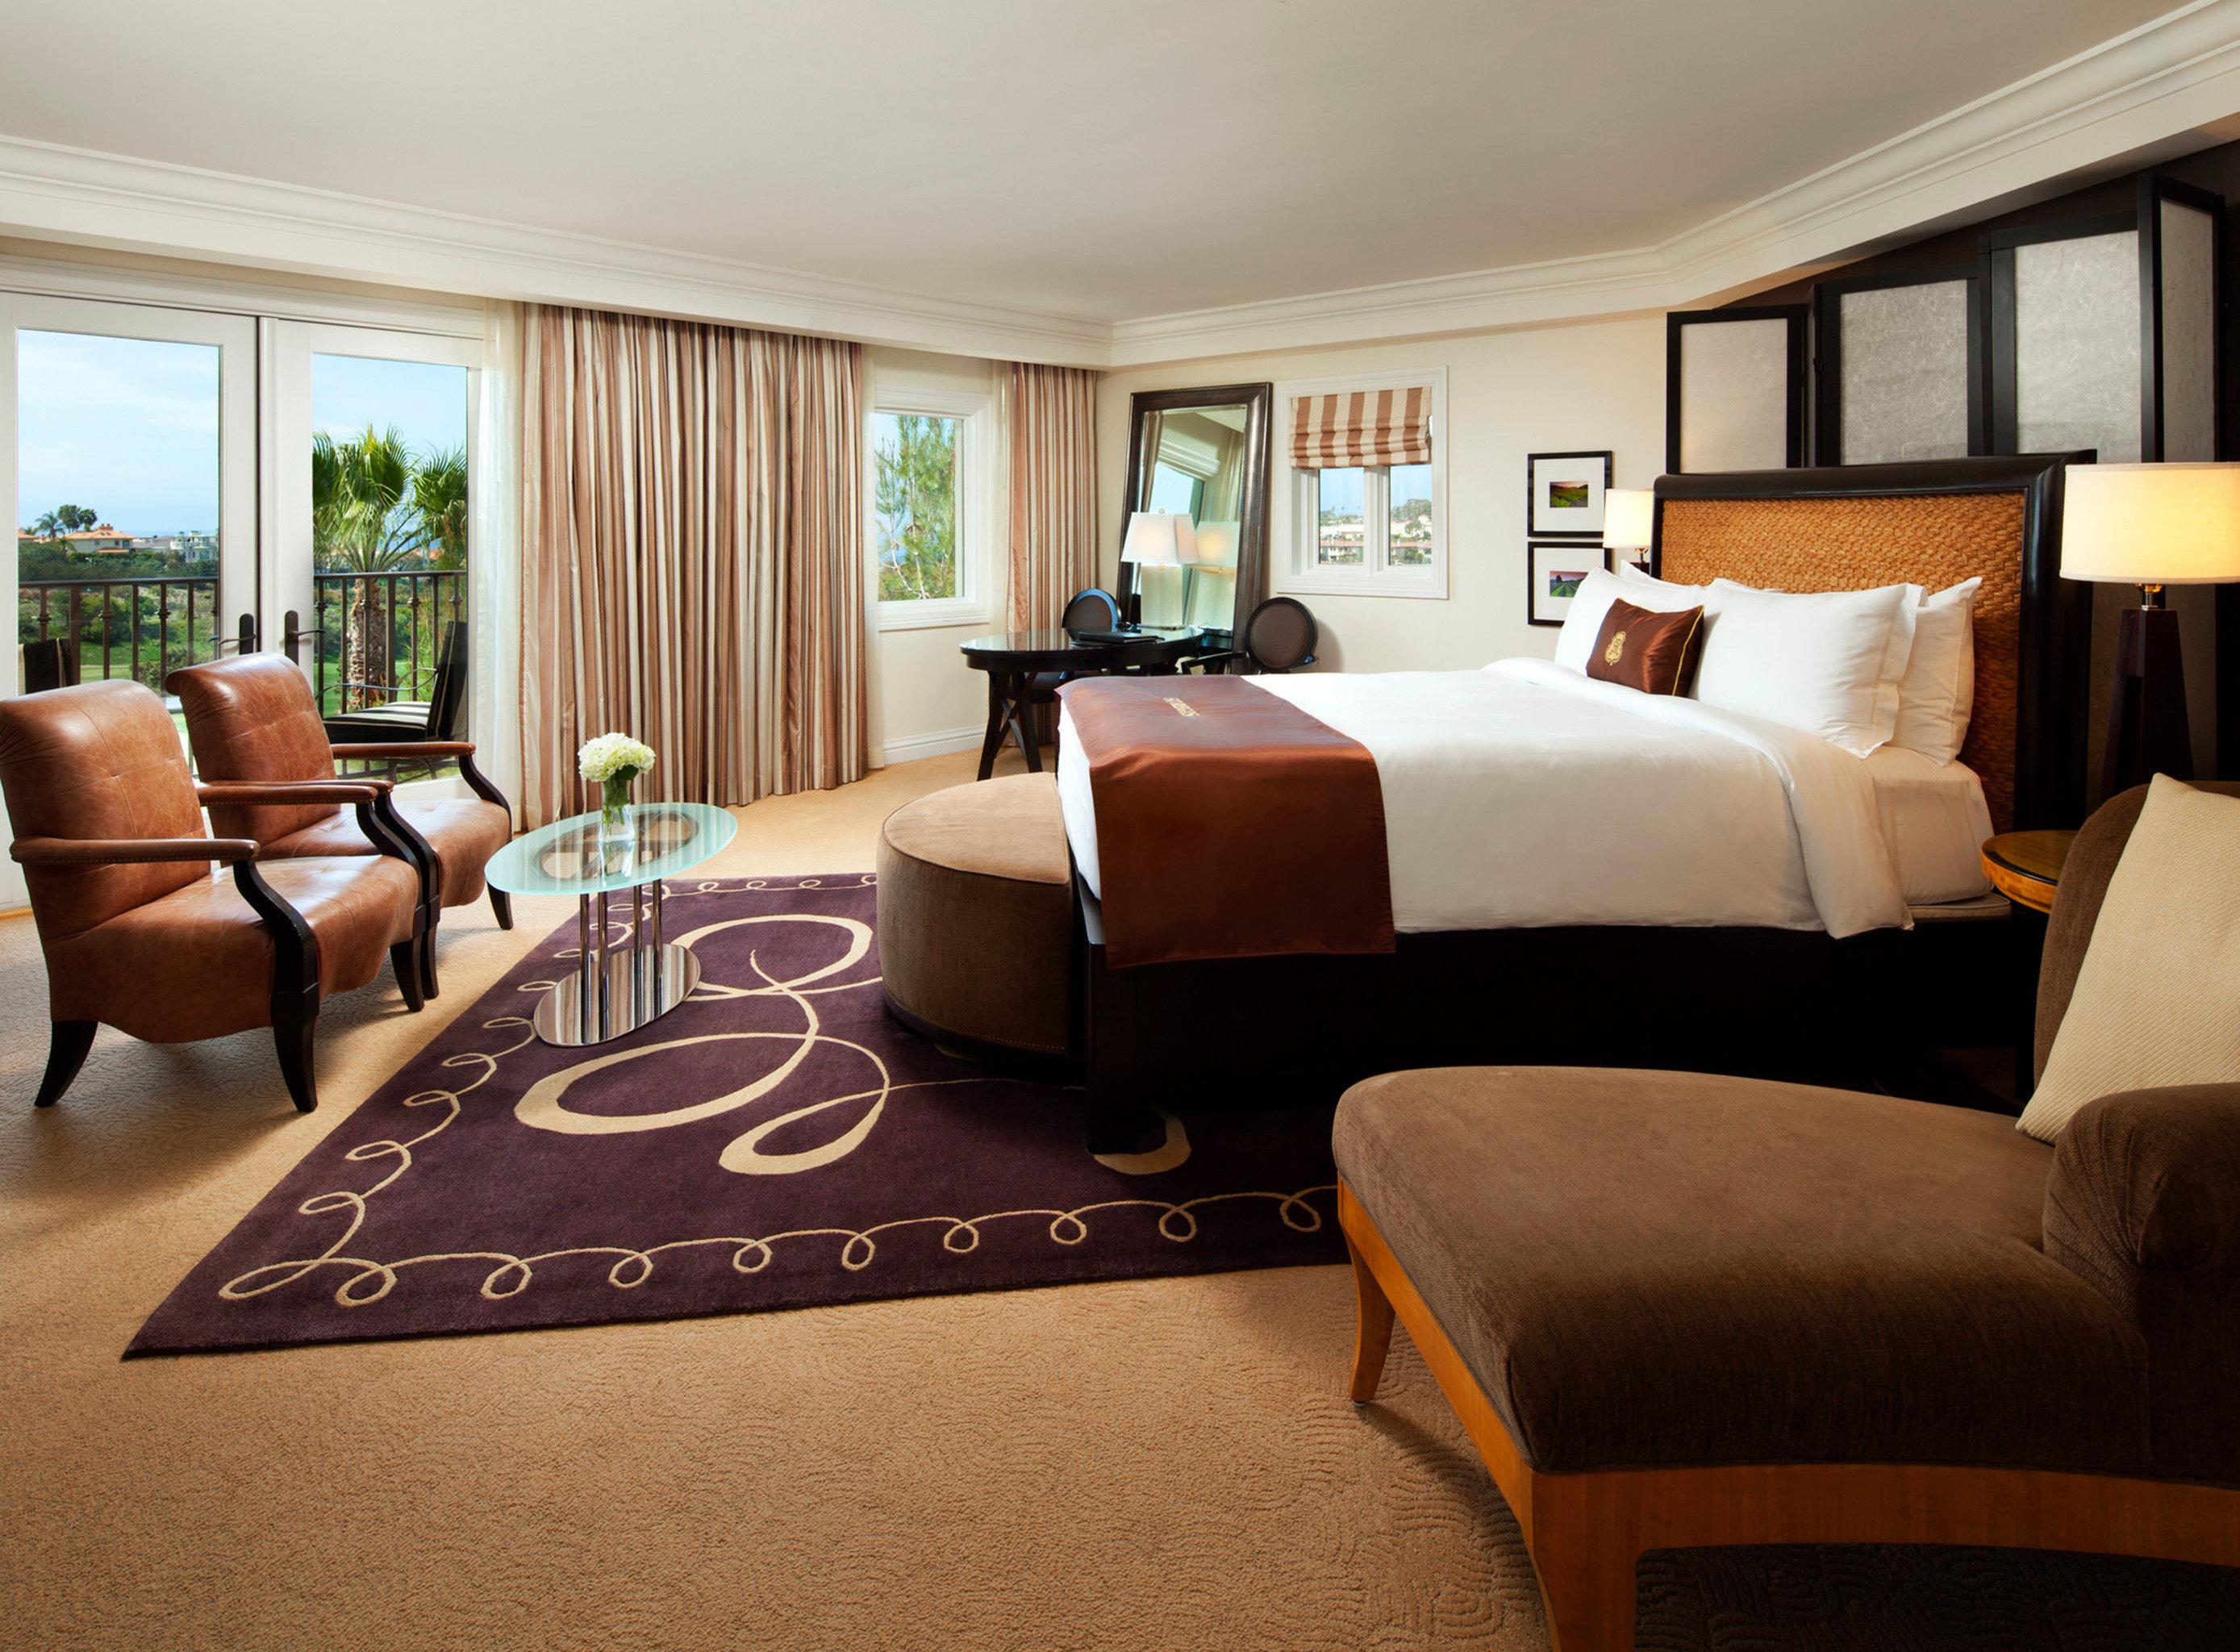 Bedroom Elegant Lounge Suite sofa property living room home hardwood bed sheet condominium